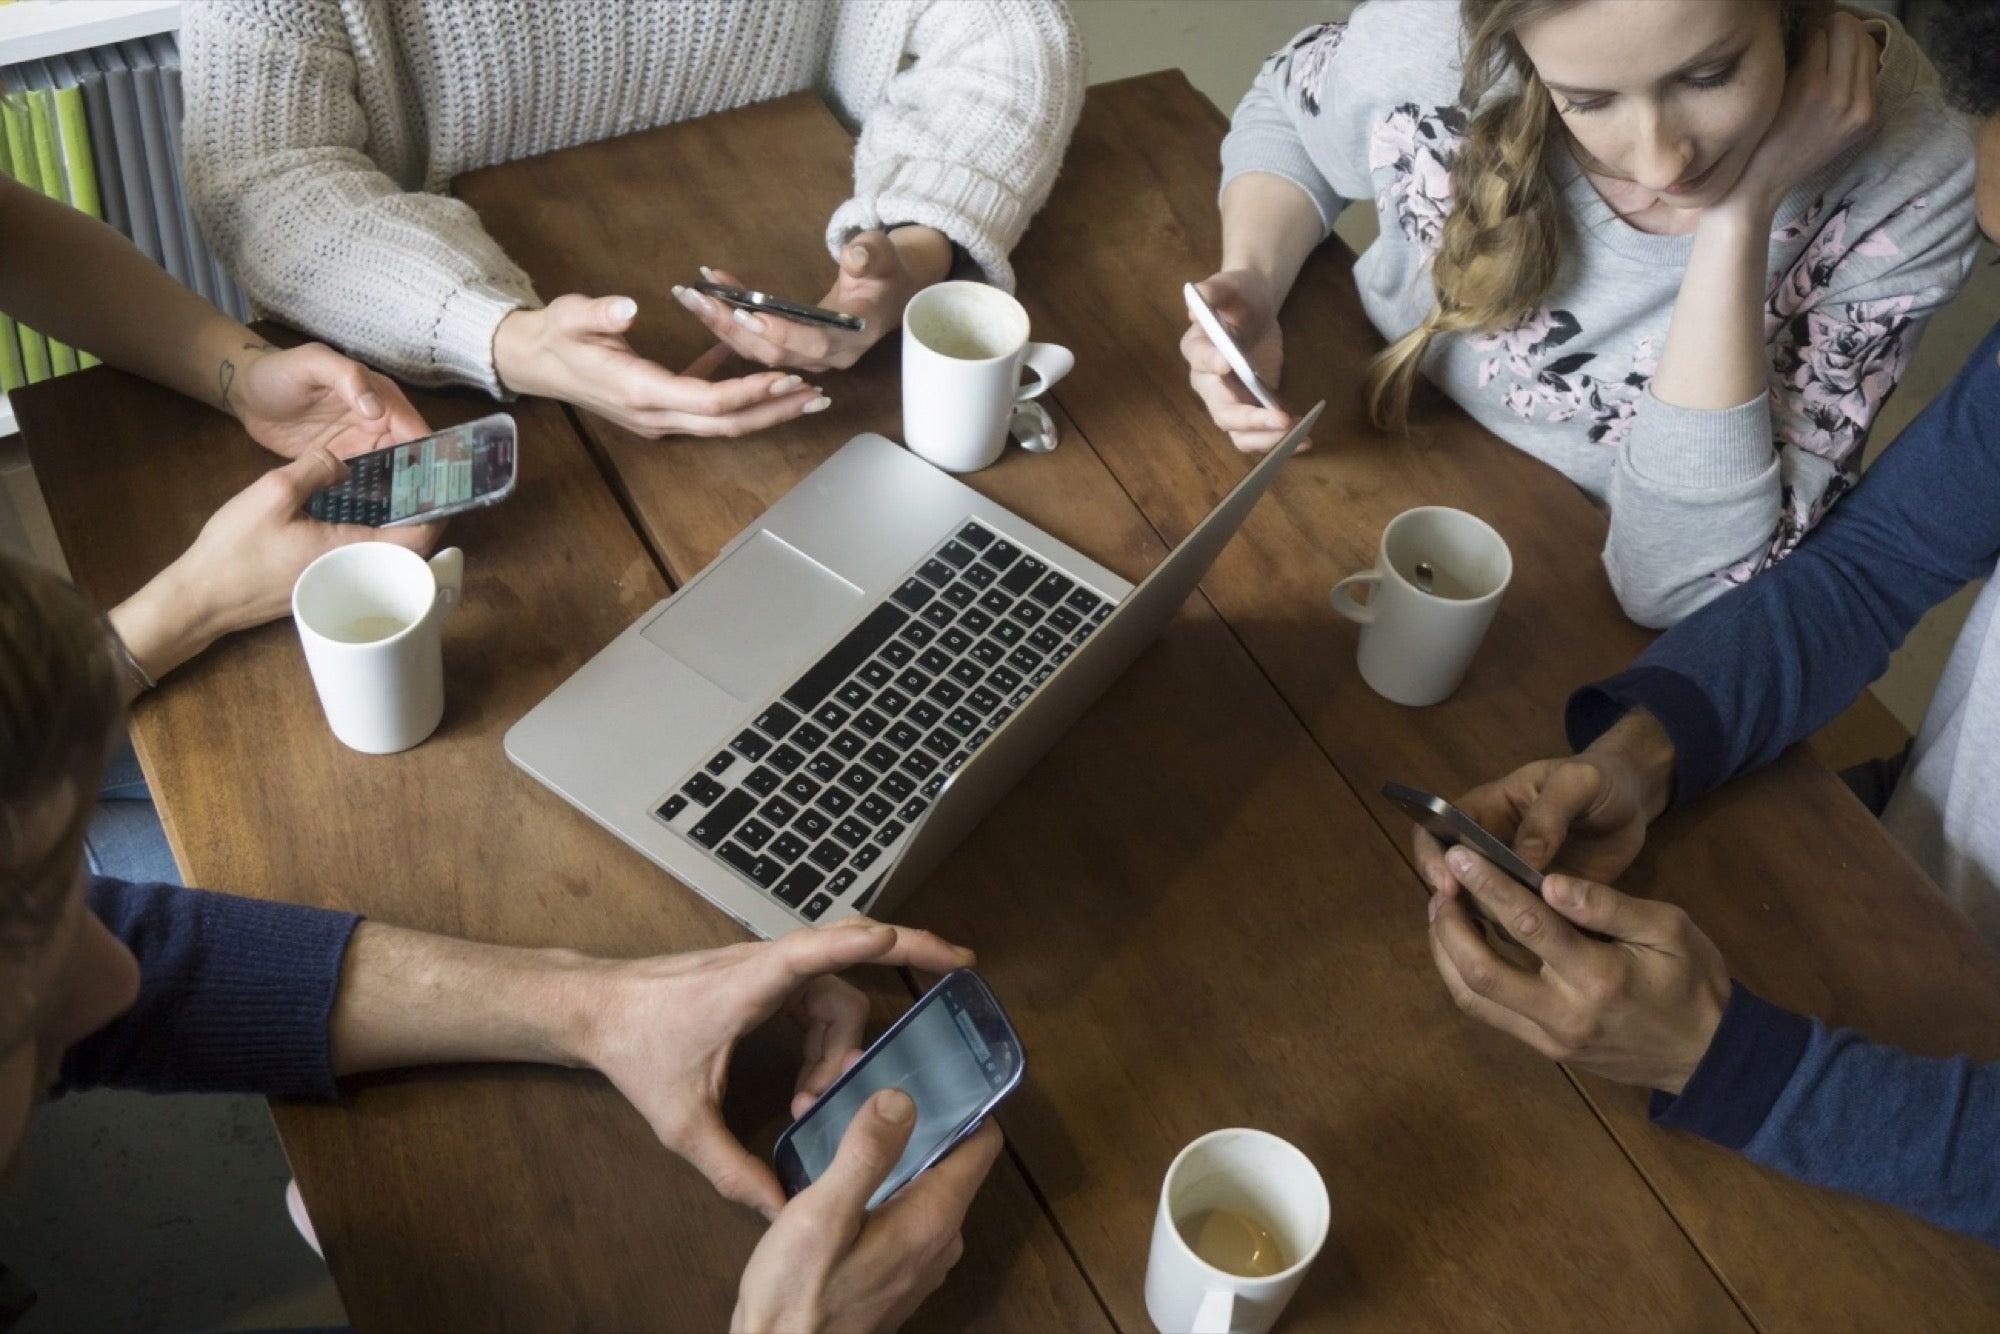 entrepreneur.com - Serenity Gibbons - Where Is Social Media Headed in 2018 and Beyond?